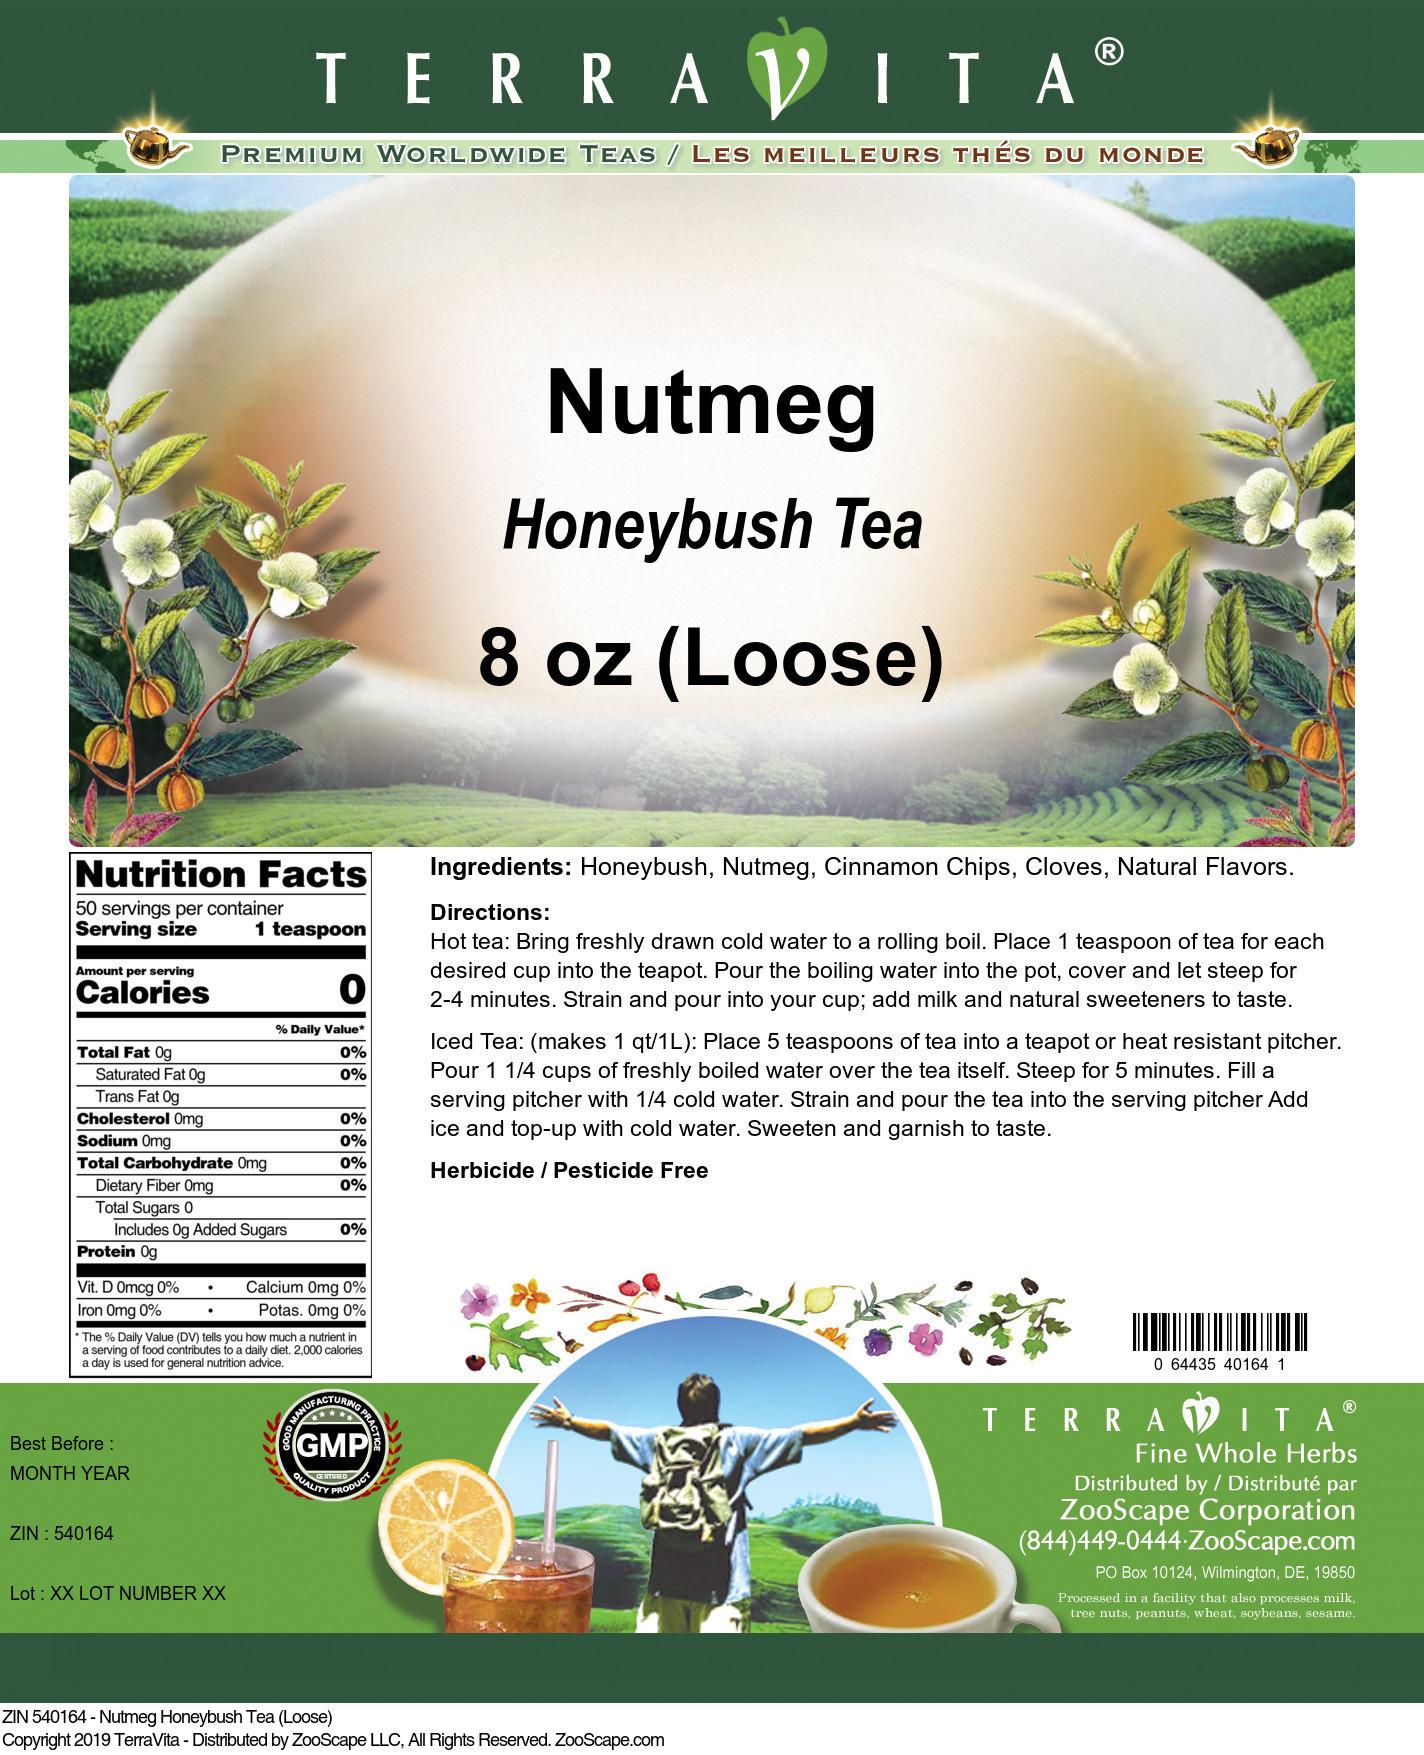 Nutmeg Honeybush Tea